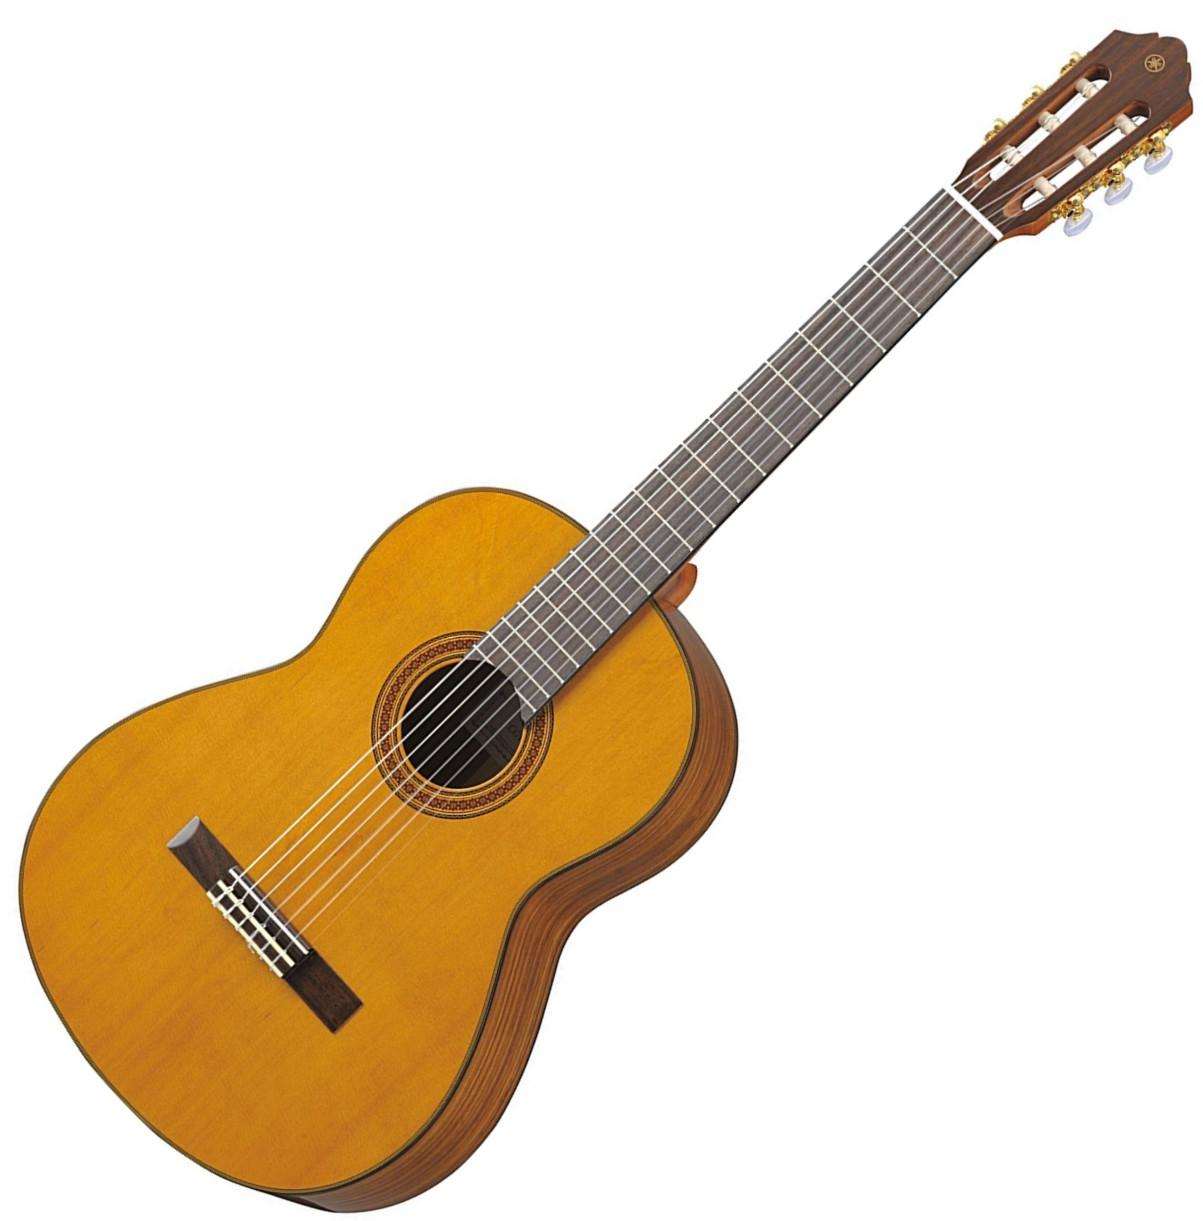 Guitare classique format 4/4 Yamaha Série C - C80 - natural